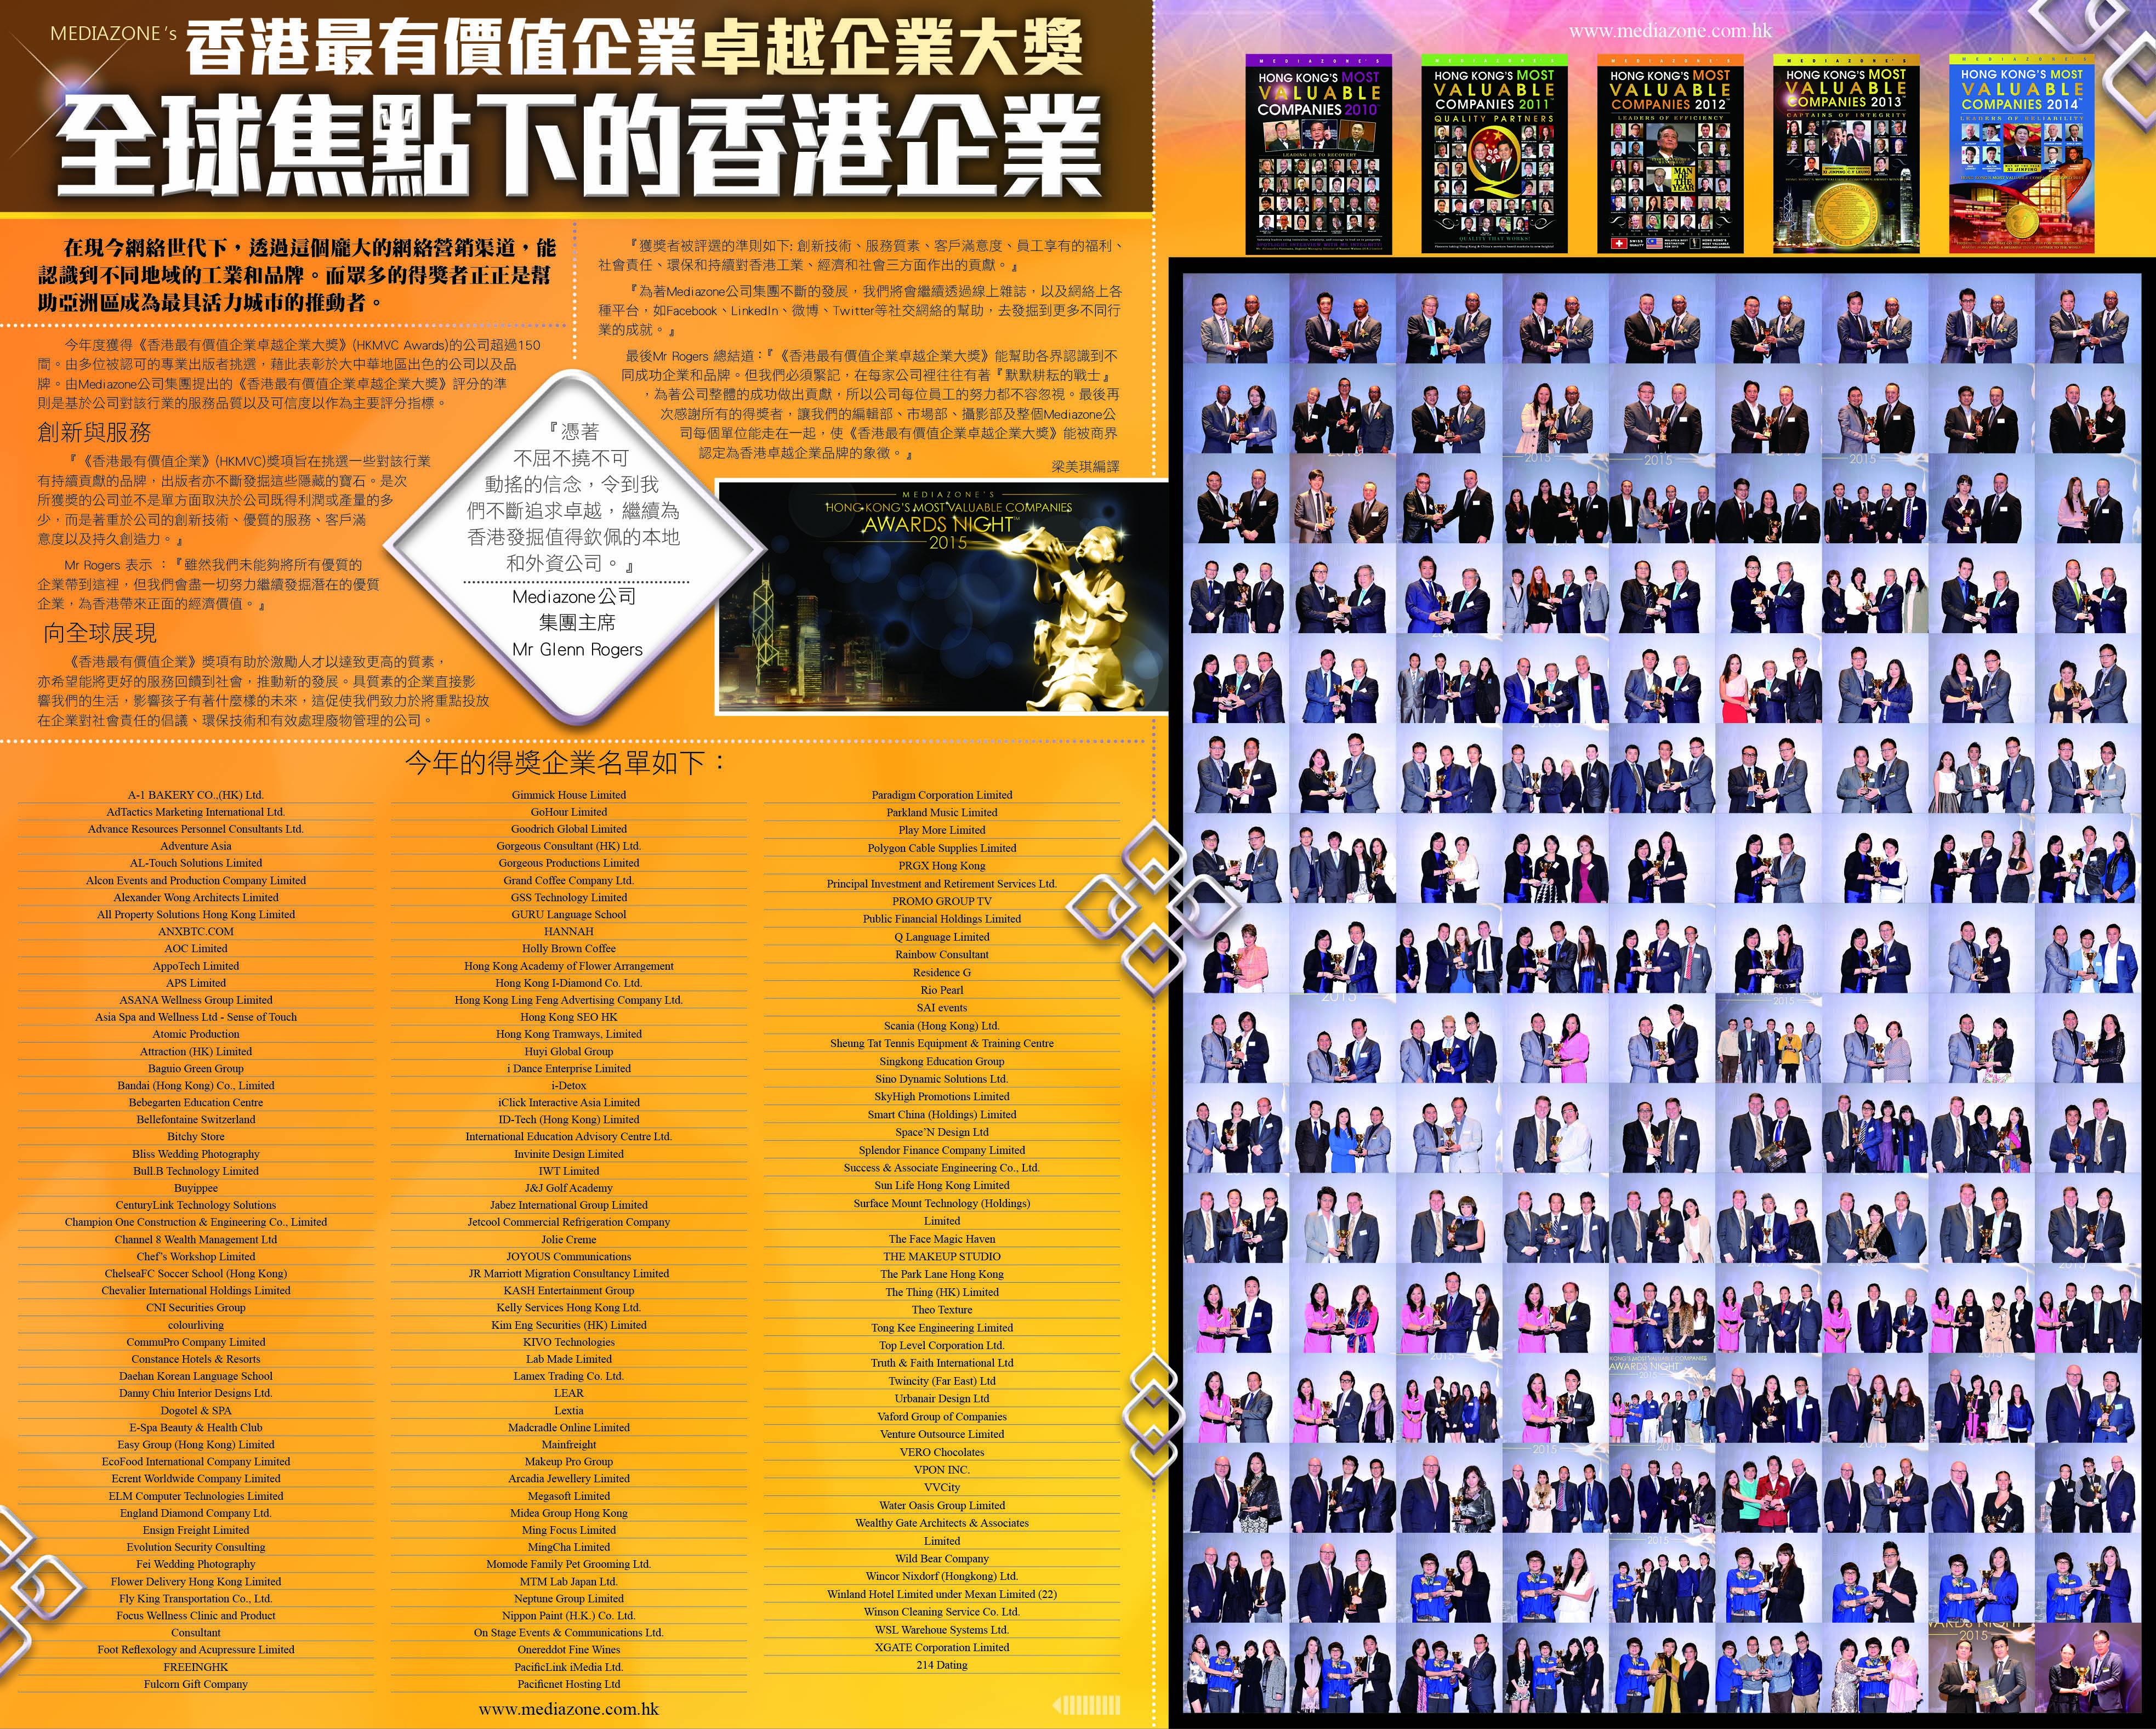 FINAL Sing Tao.jpg